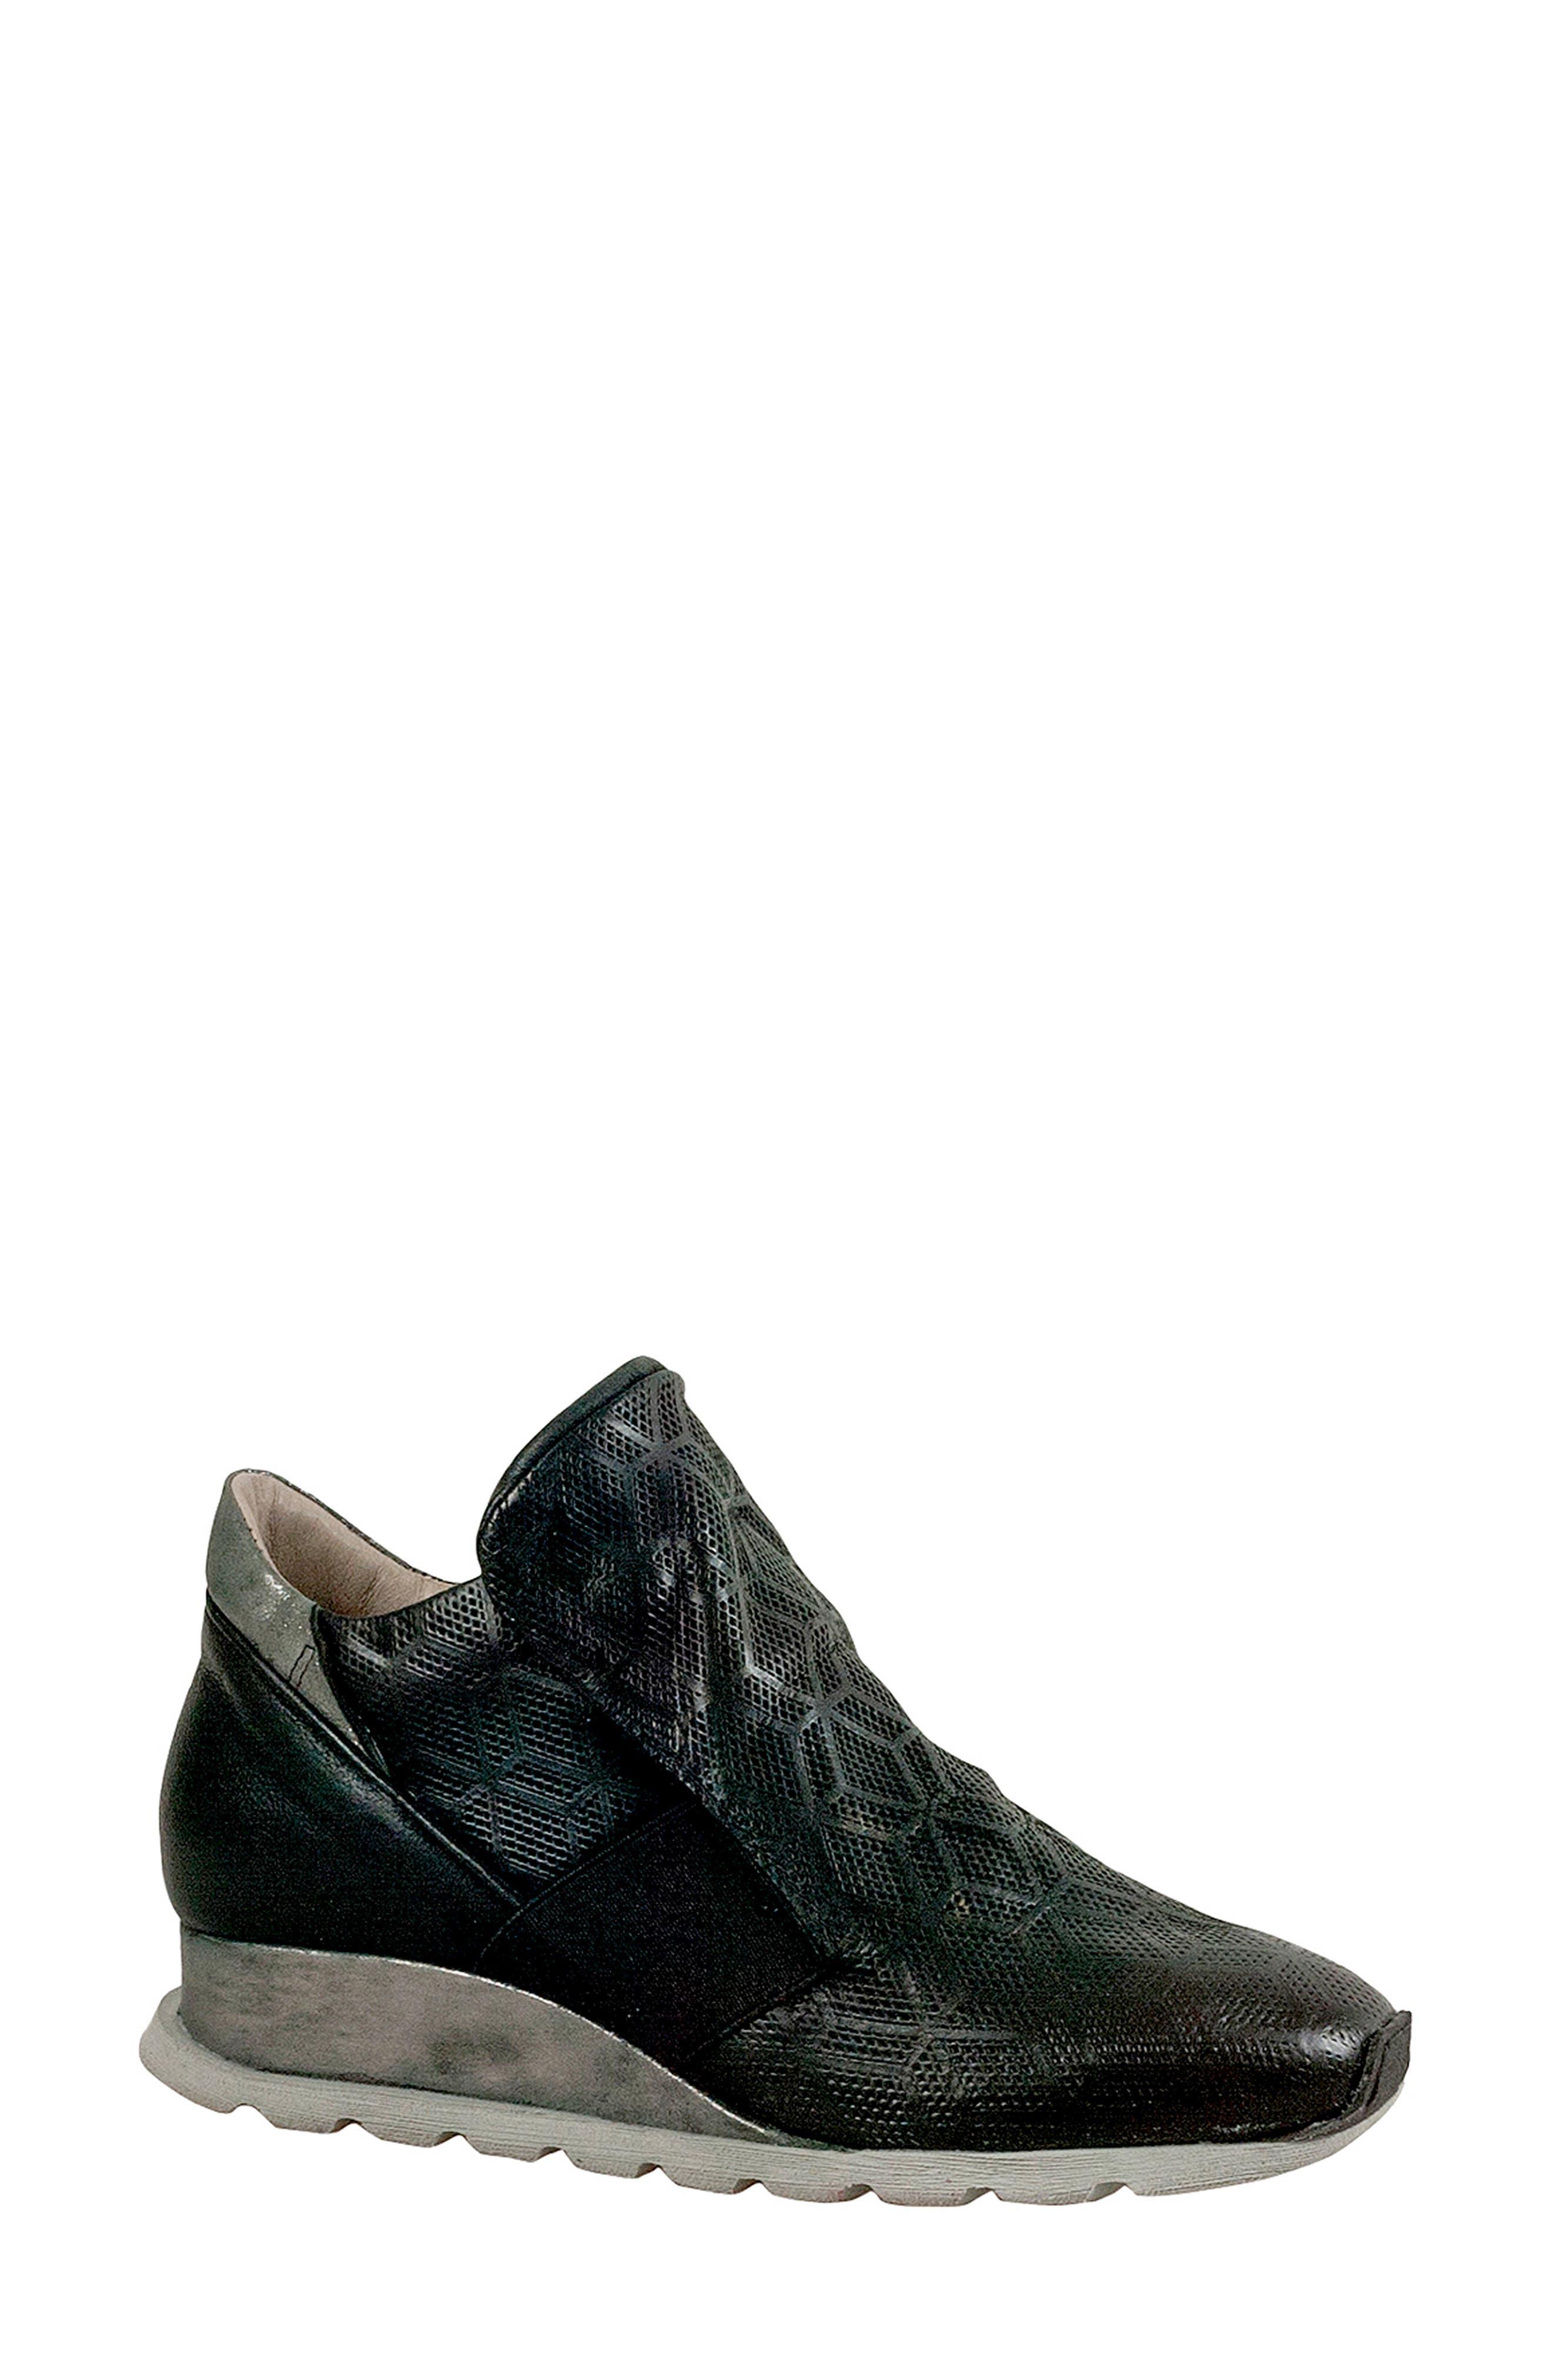 Miz Mooz Canarsie Sneaker, Black